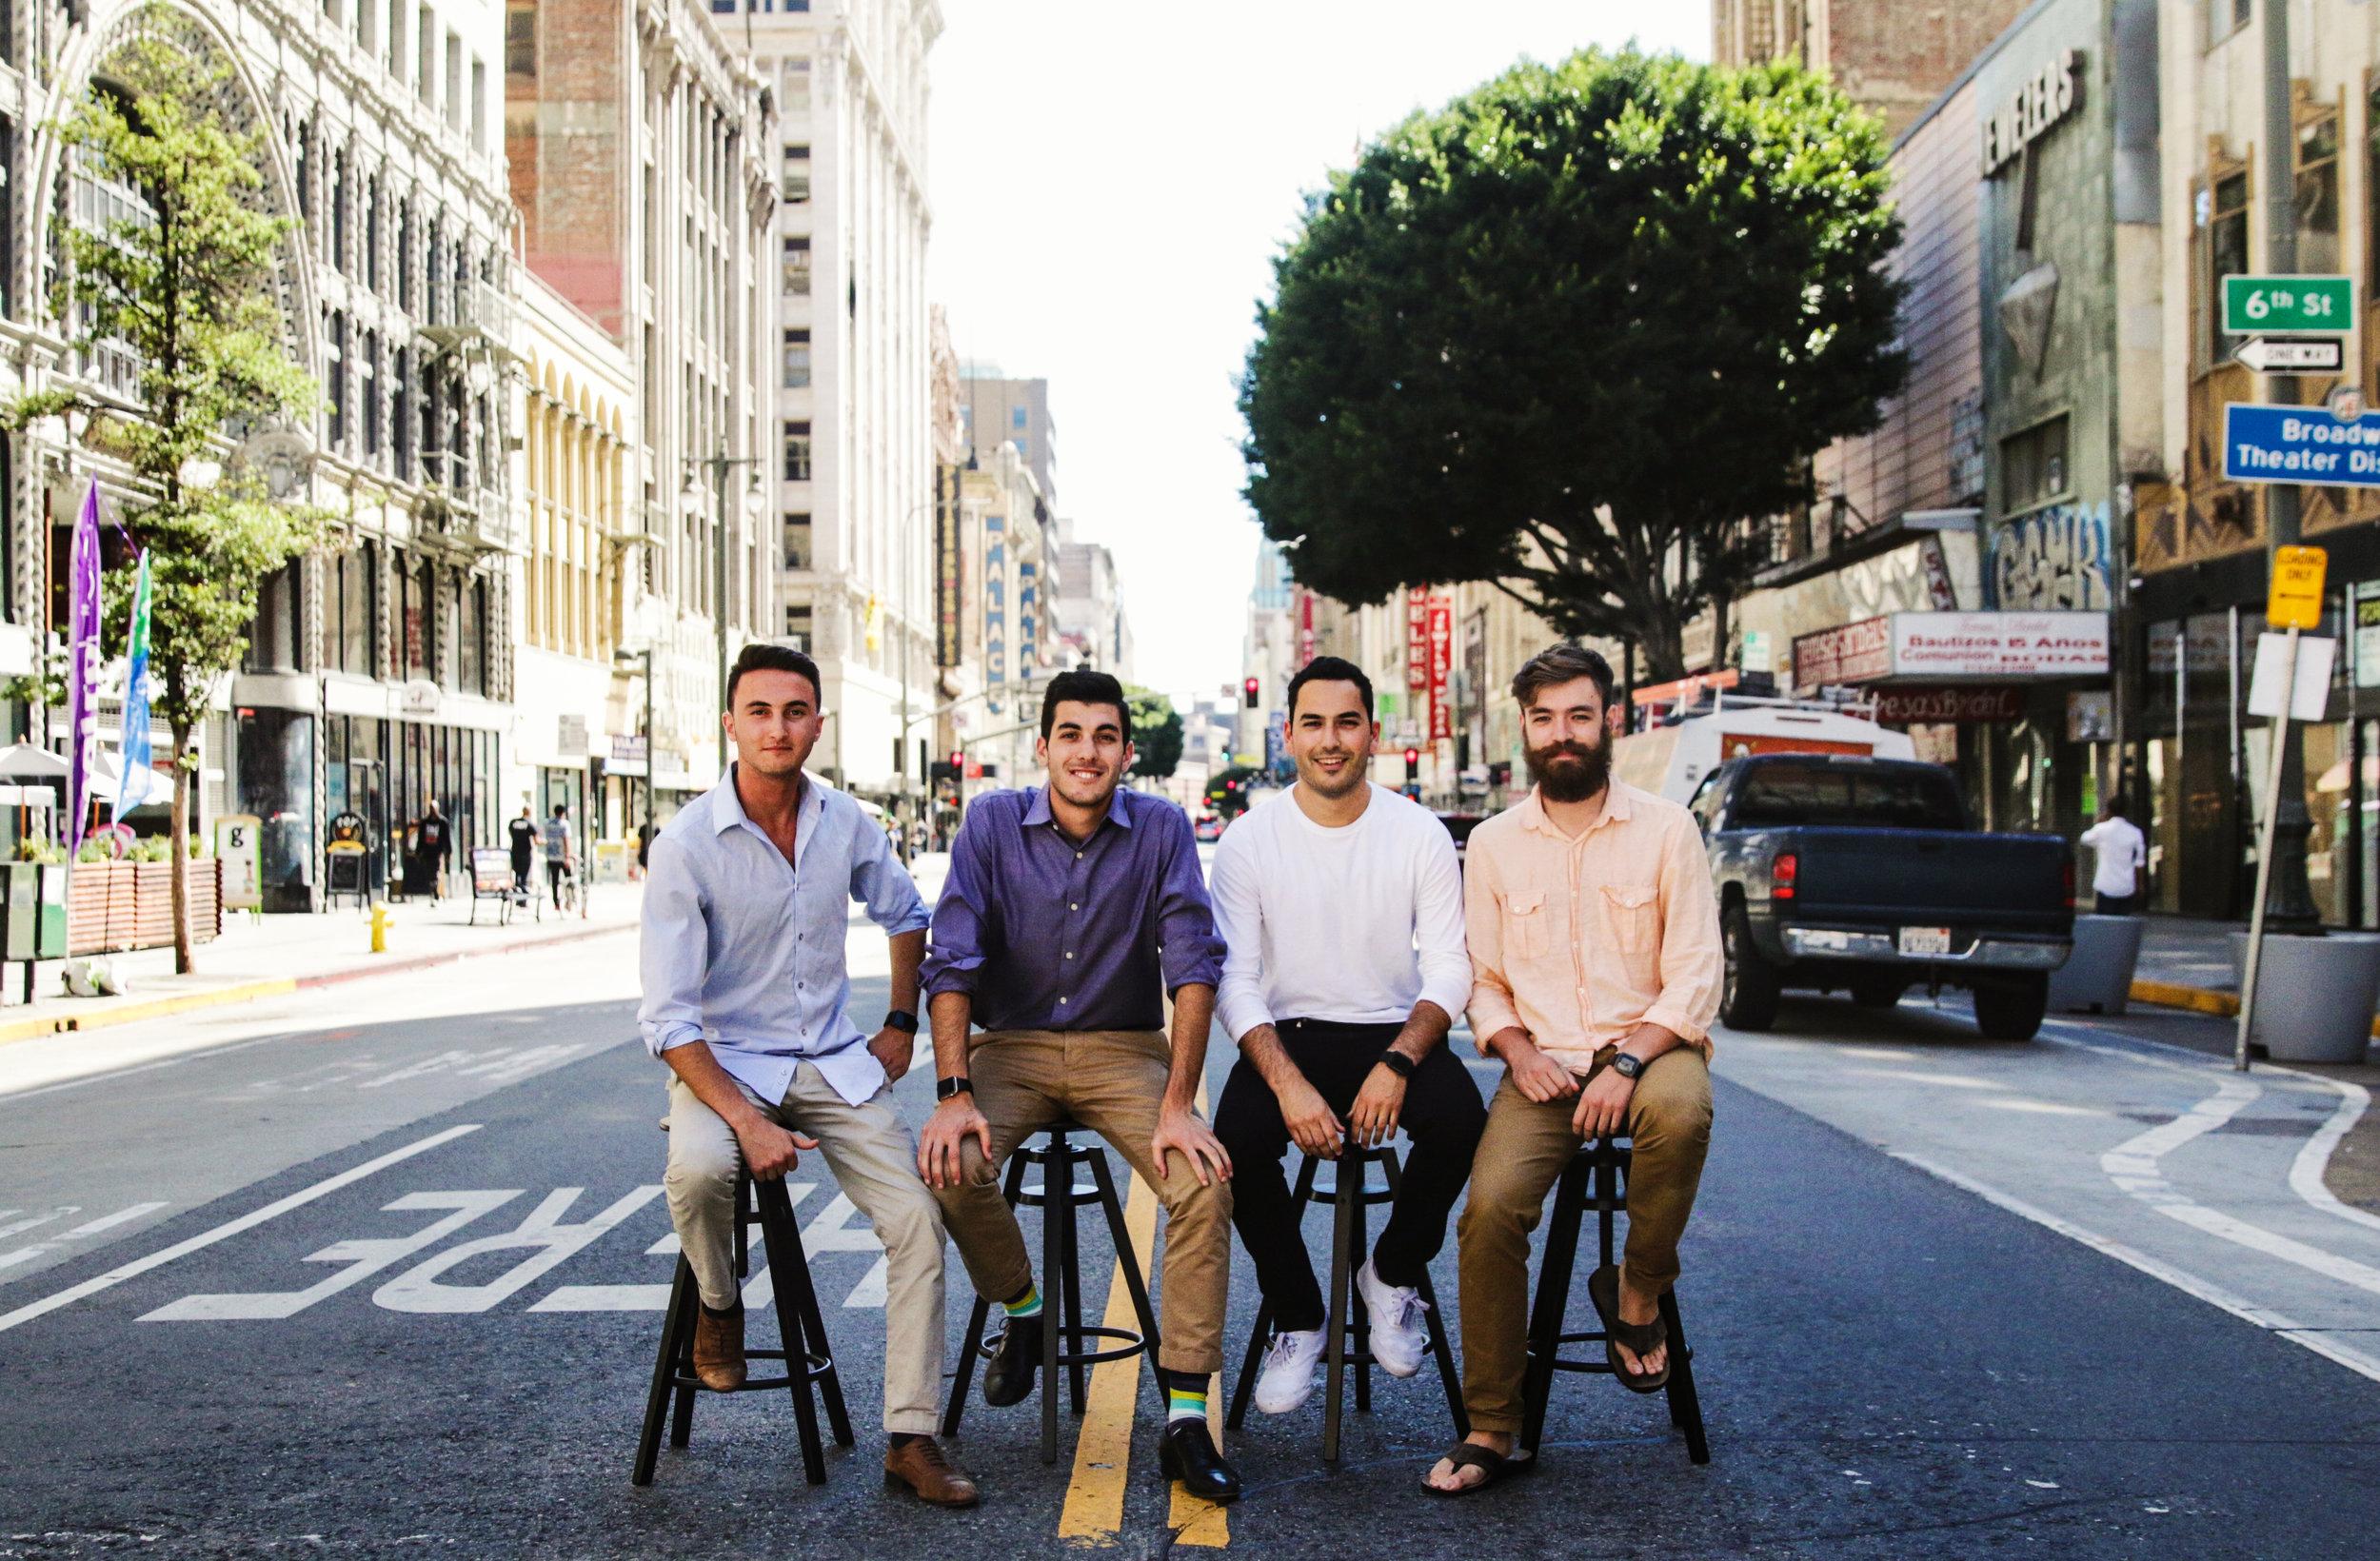 From left to right: Ben Taft (CEO), Matt Stern (COO), Montana Reed (CPO), Evan Bovie (CTO)